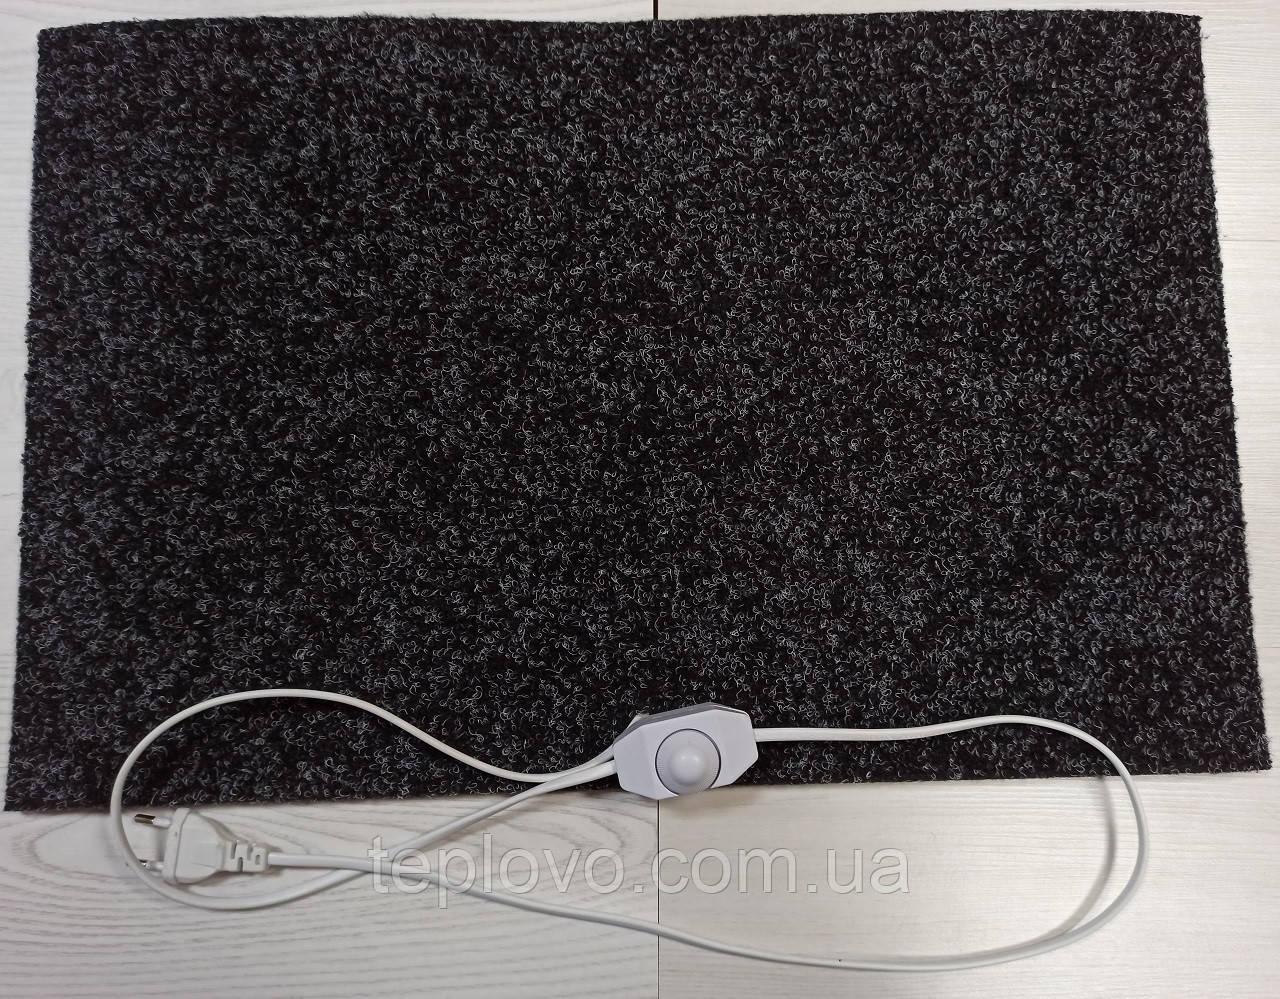 Электрический коврик с подогревом, 55х80 см, с регулятором